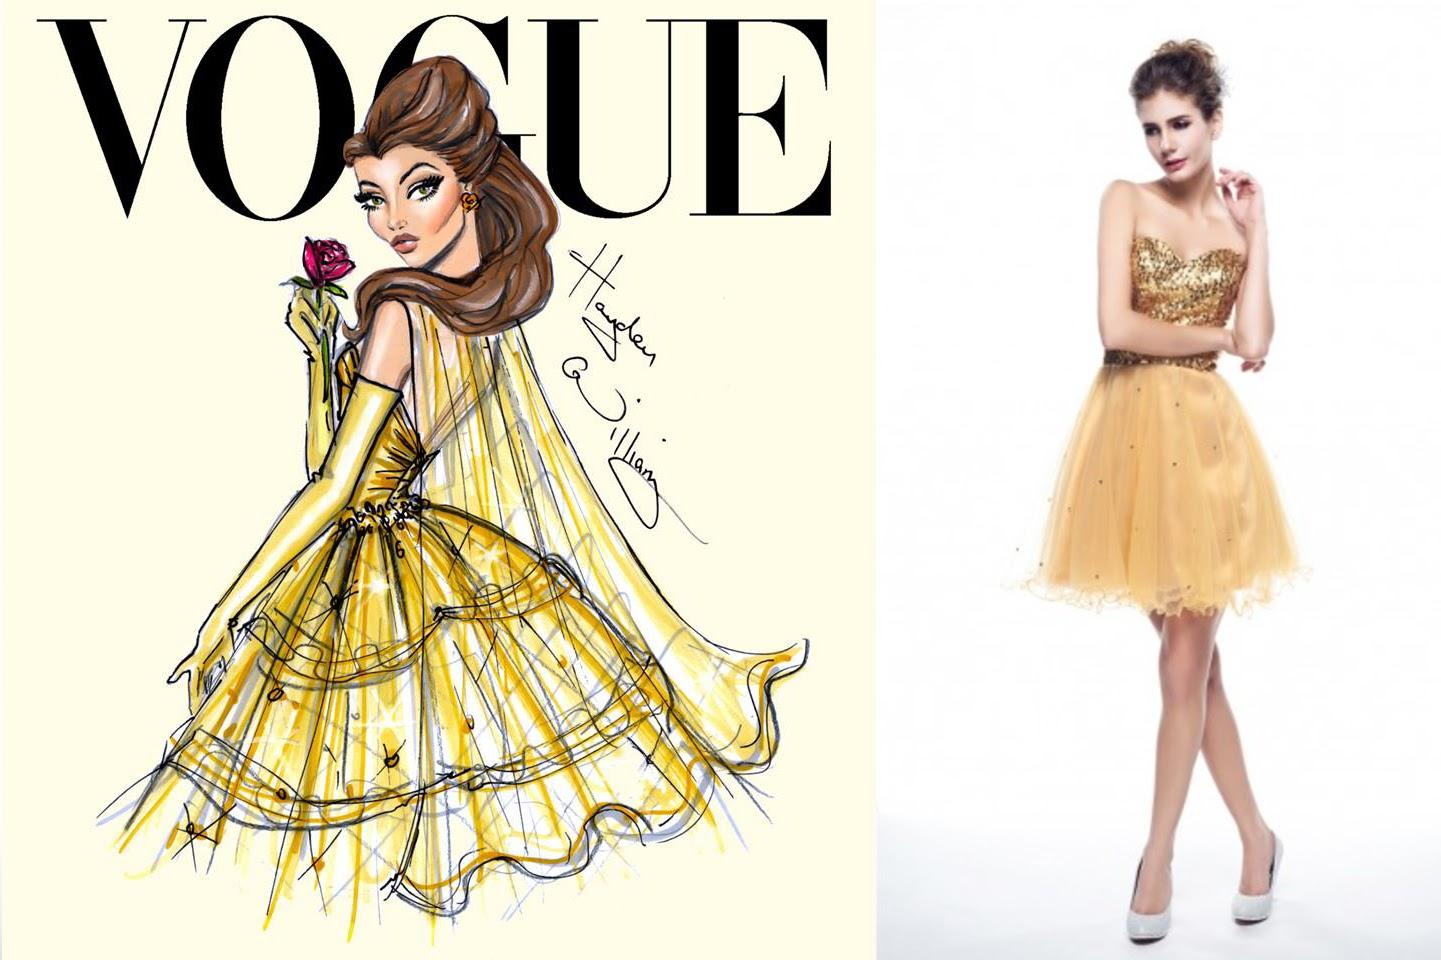 fashion blogger dress promtimes wedding cocktail vestiti principesse disney vogue princess shopping moda trend